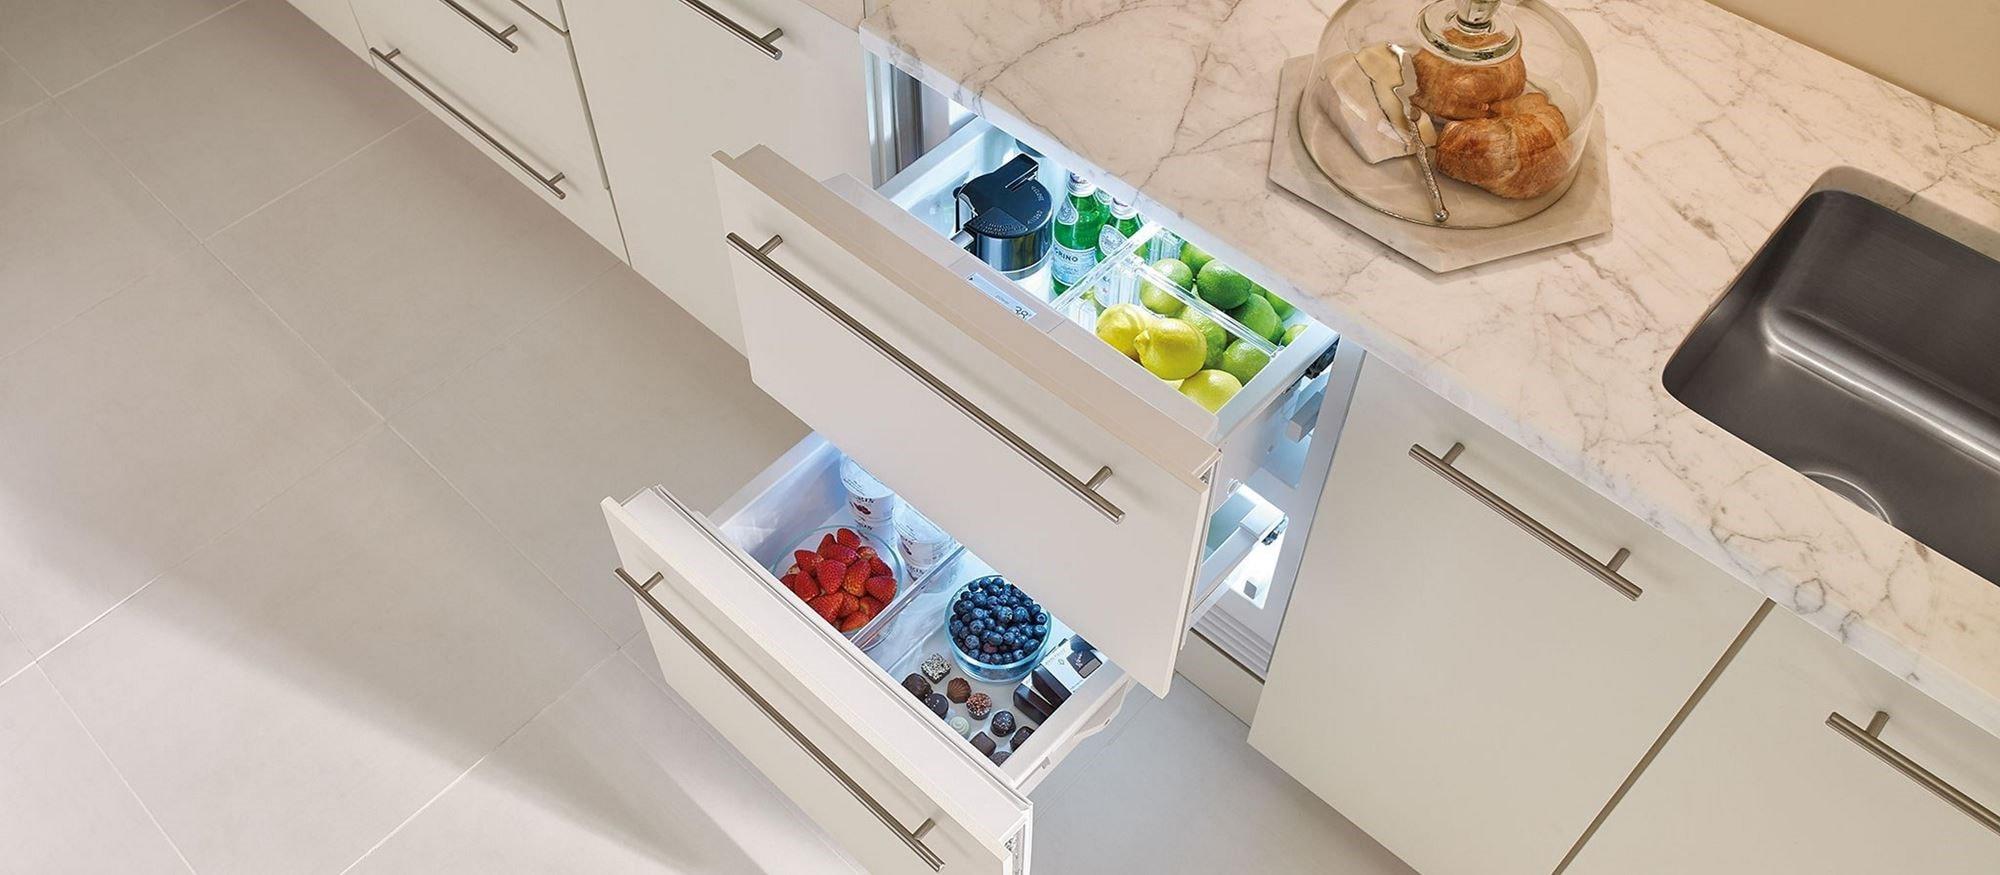 Sub Zero 24 Refrigerator Drawers Panel Ready